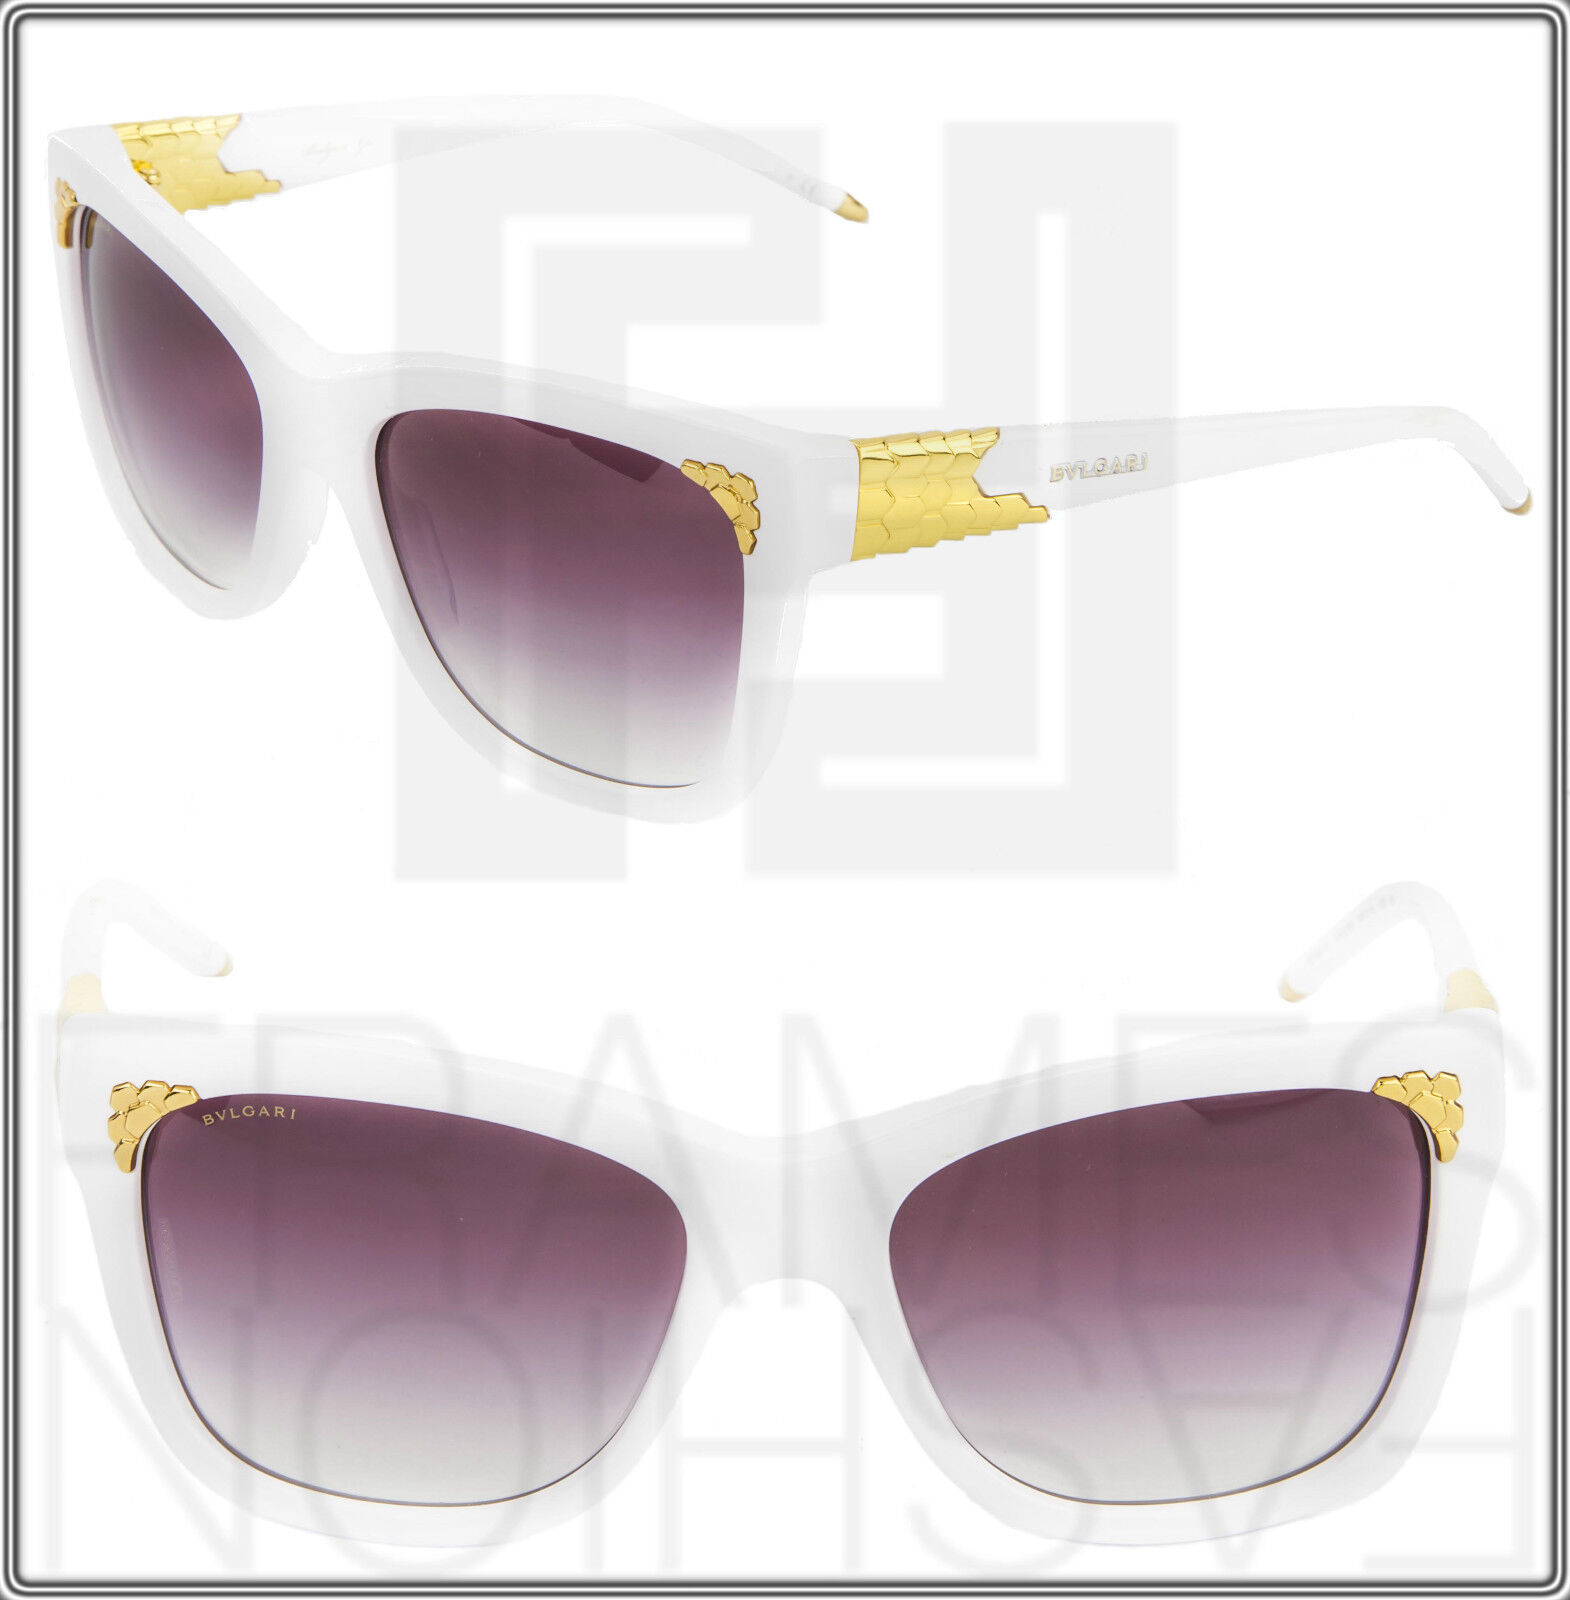 BVLGARI Serpenti BV8134K White 24K Gold Sscales Plated Edition Sunglasses 8134